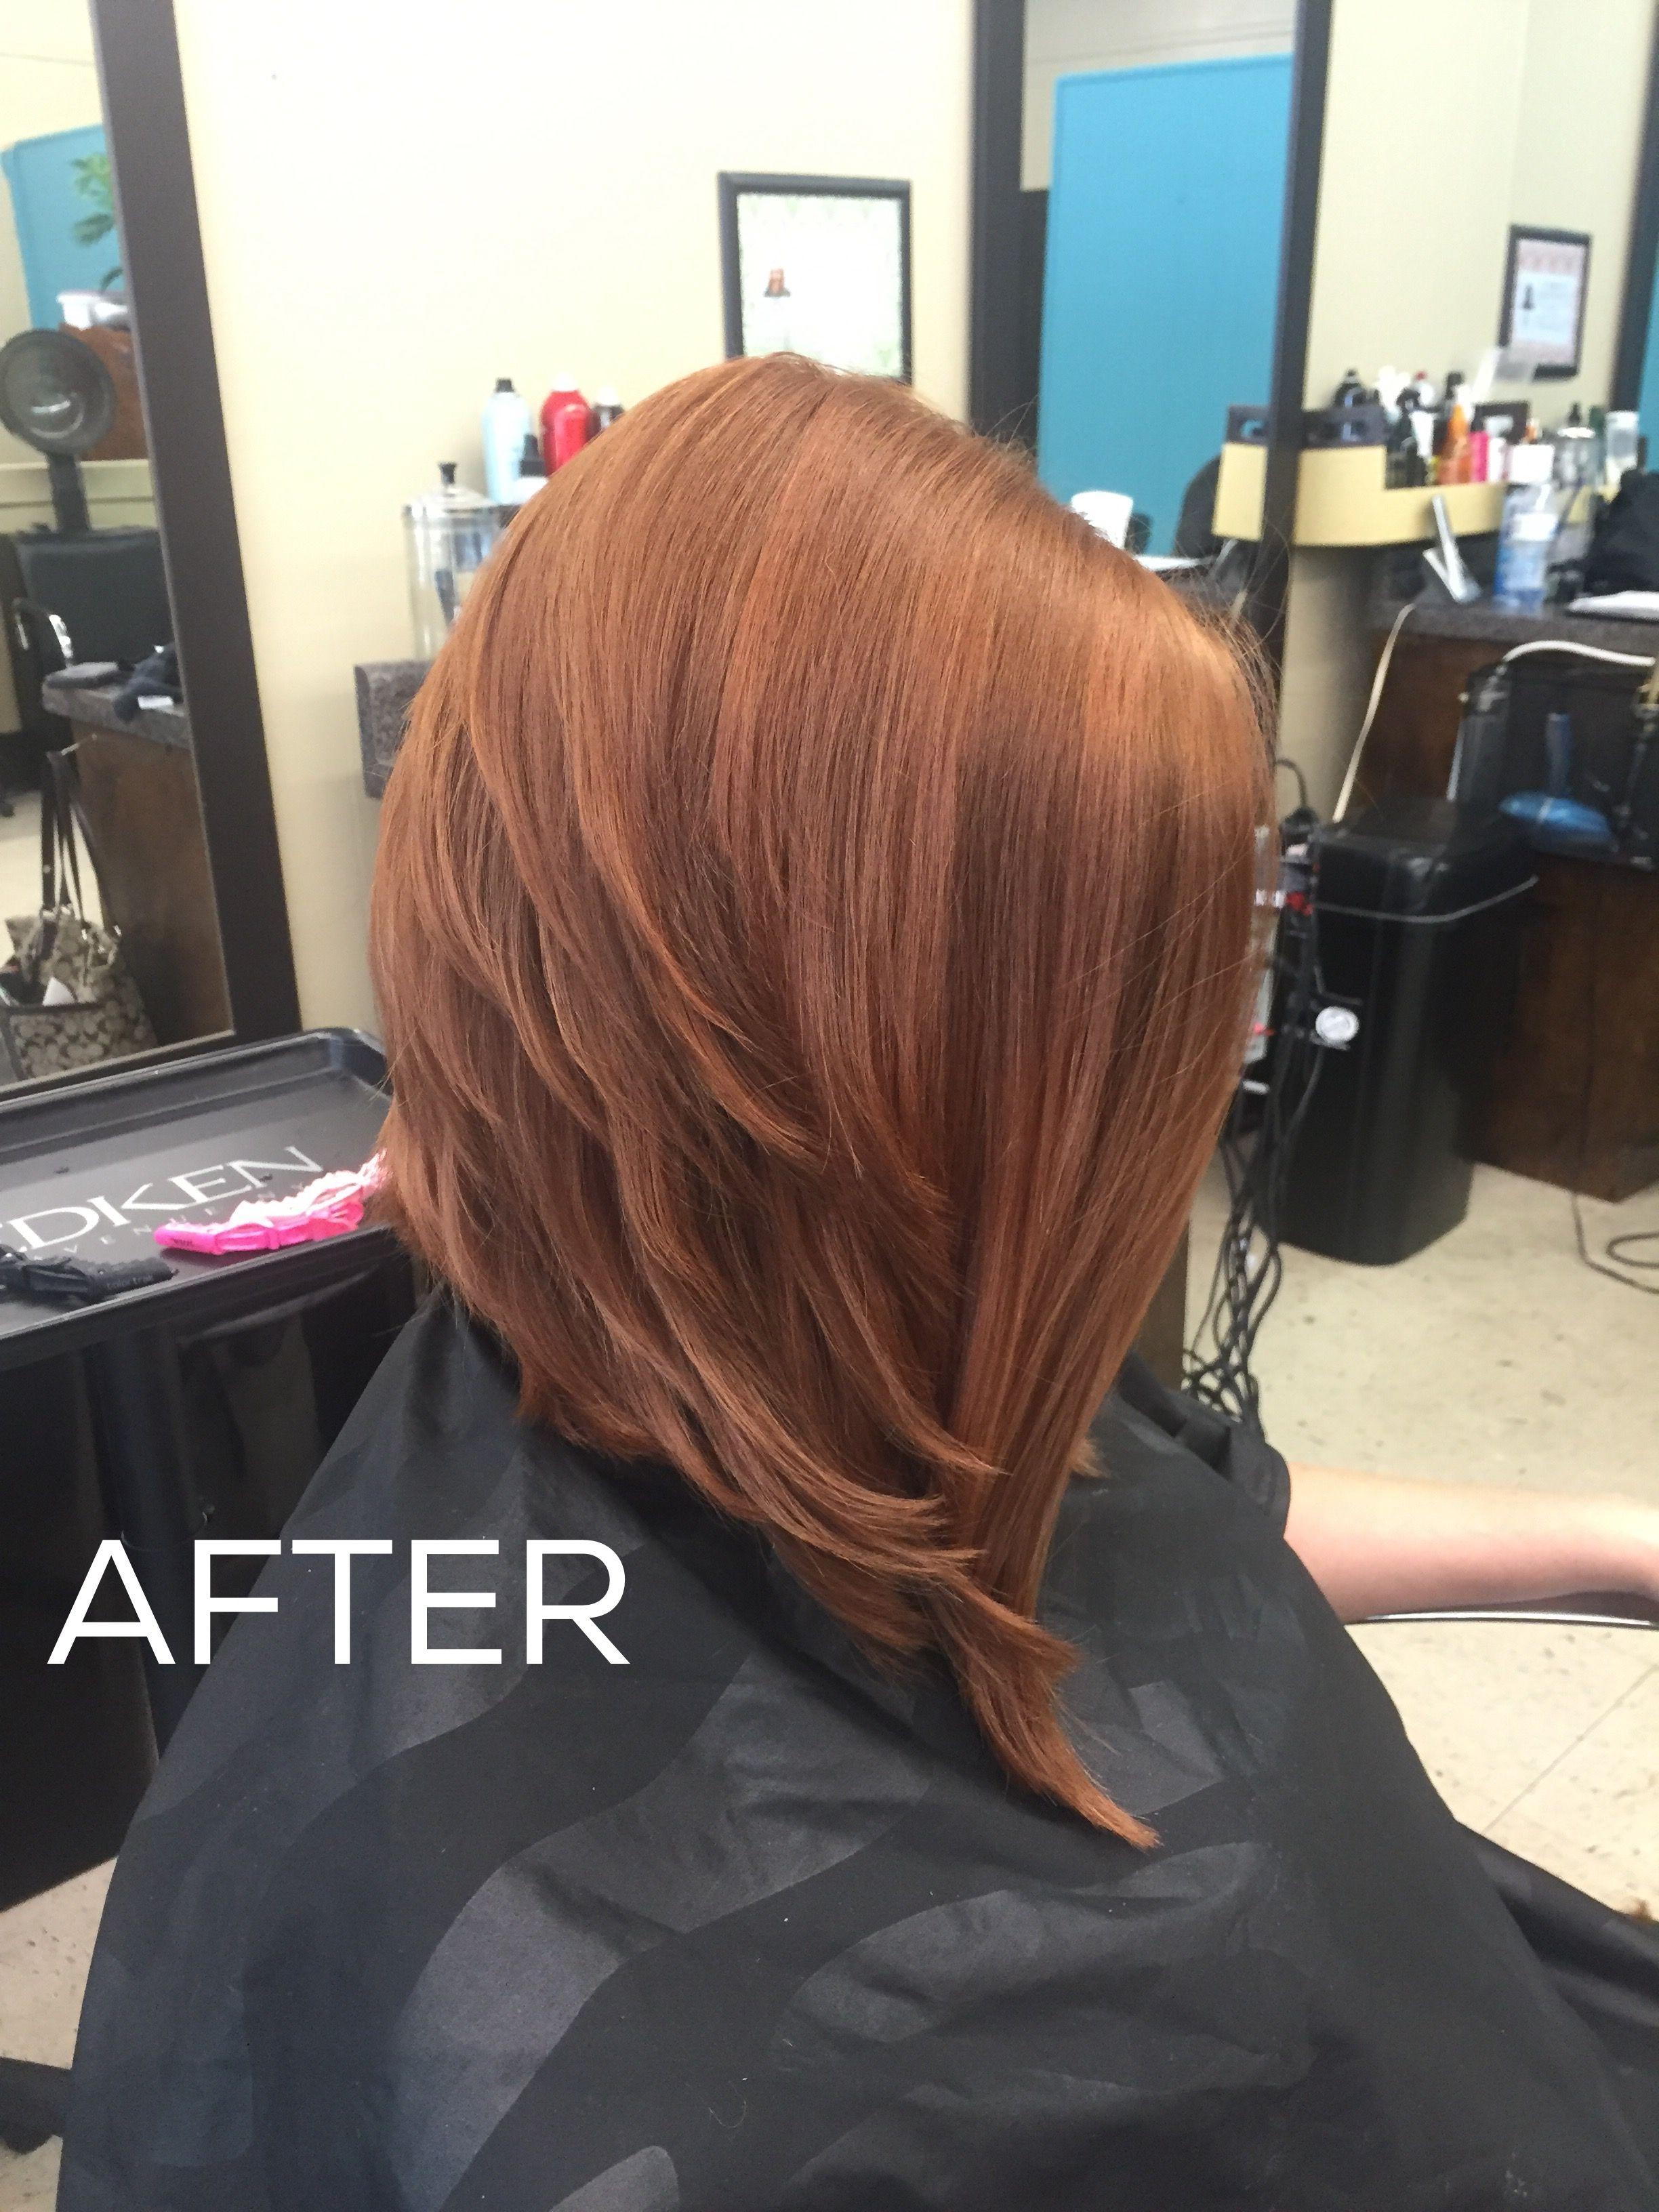 Matrix hair brush 4 - Color 7cg 7m Matrix